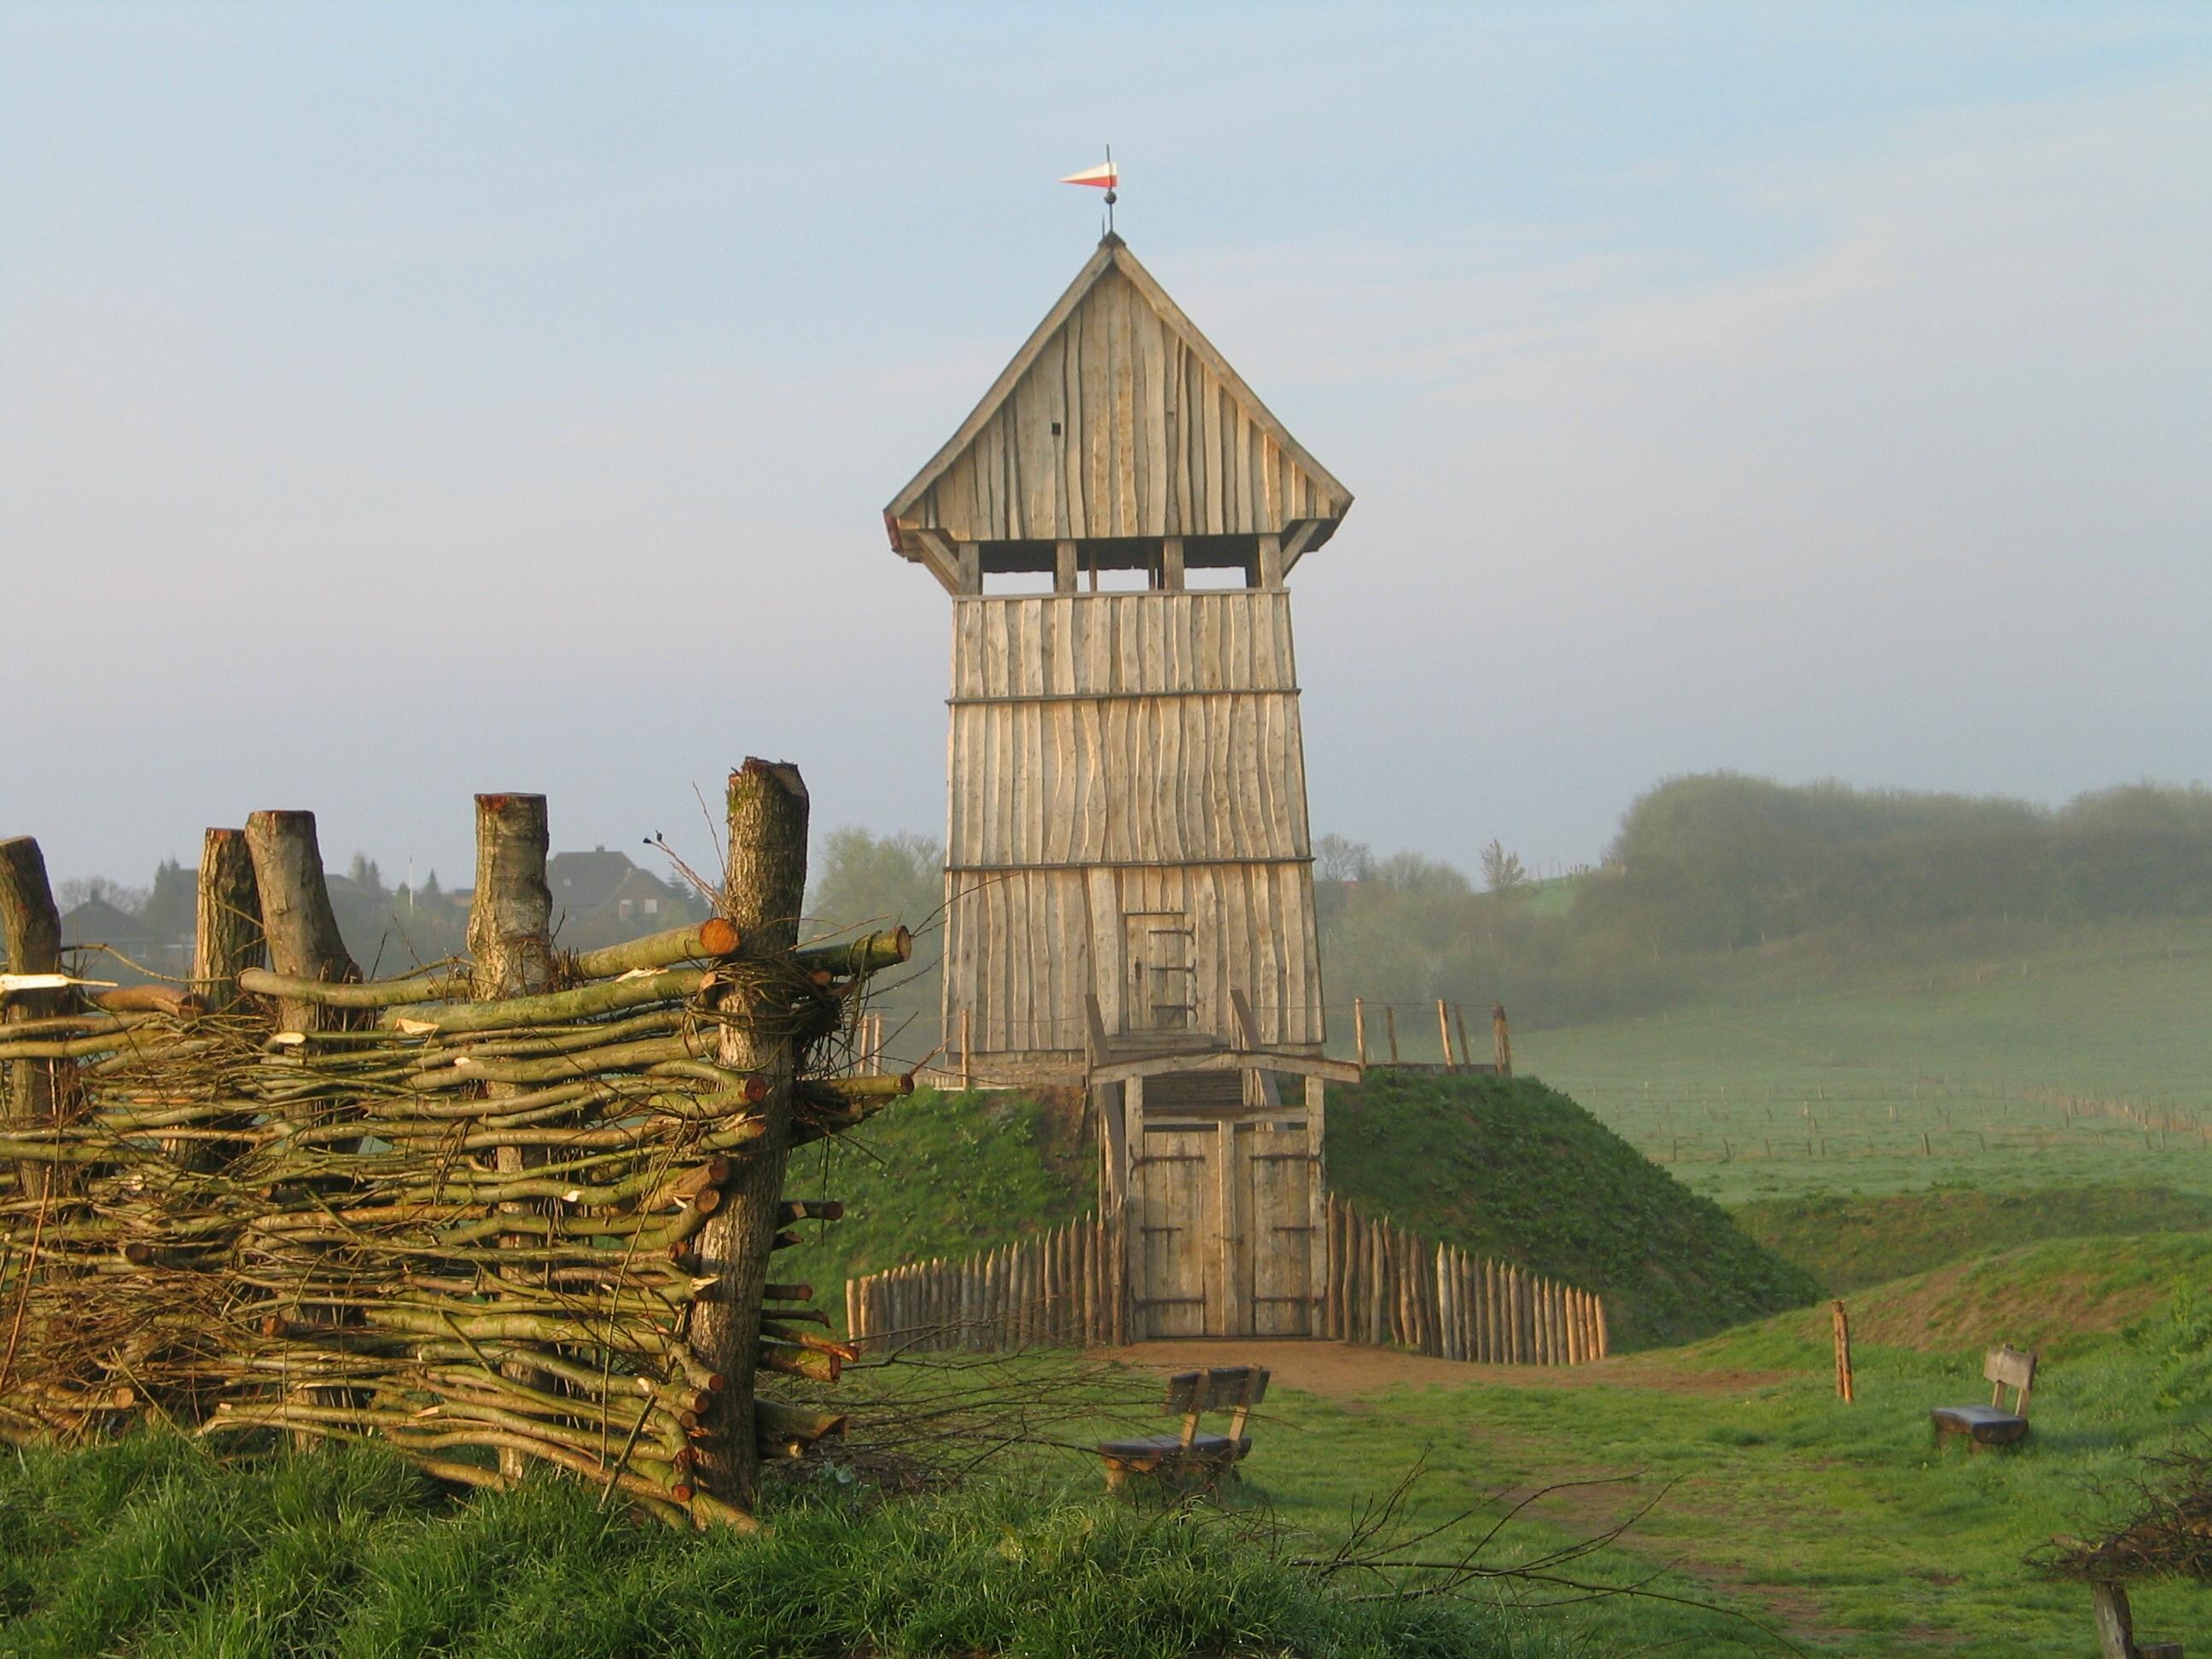 Wooden keep